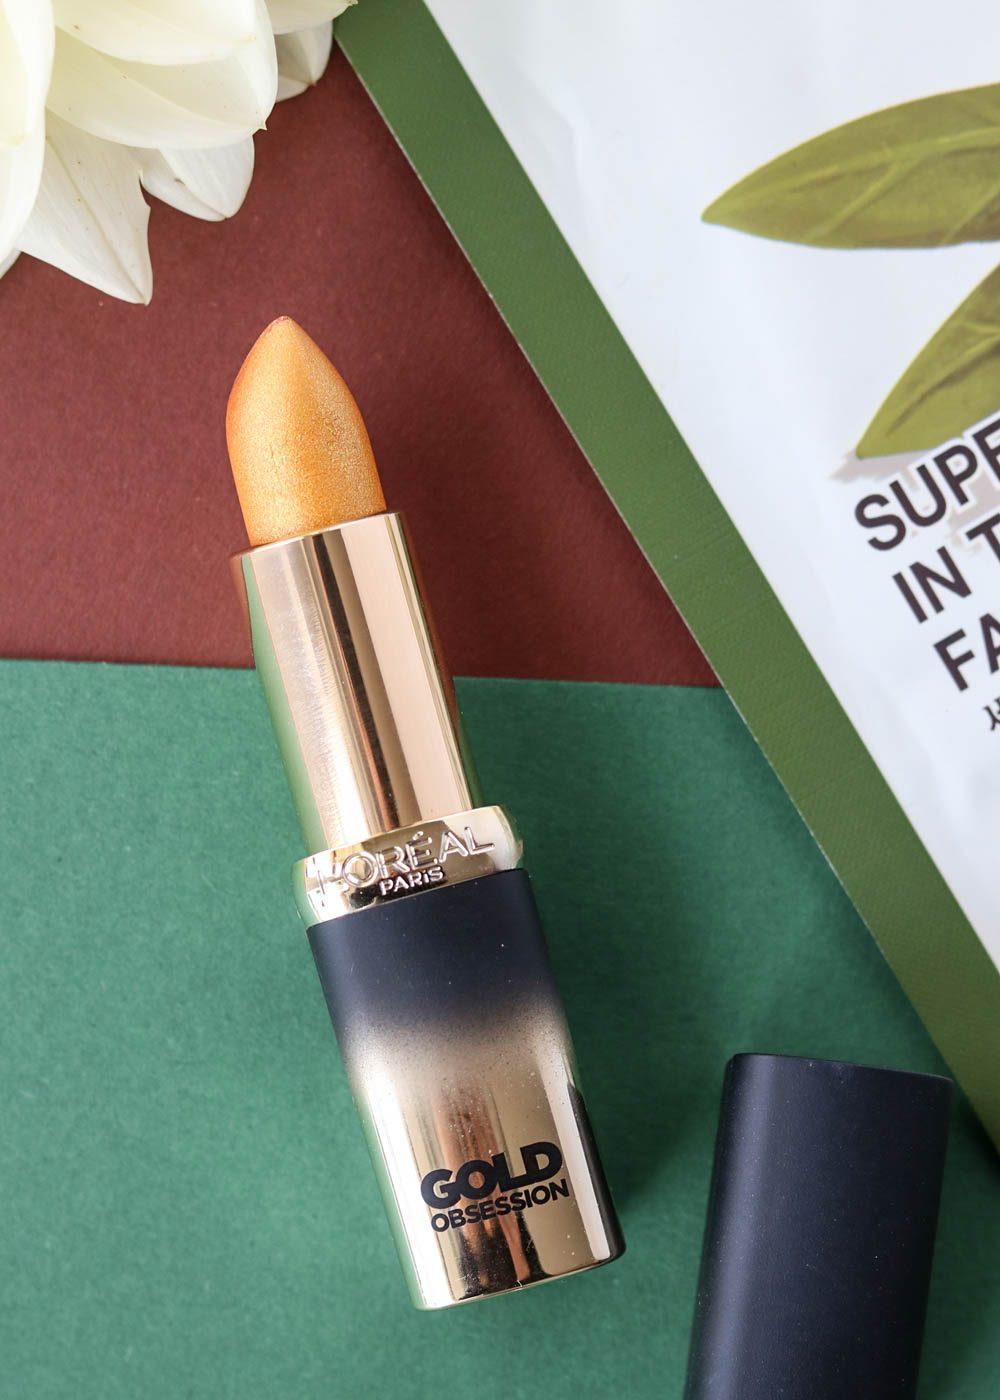 beautyblogger-favoriten-loreal-color-riche-gold-obsession-lippenstift-1-2